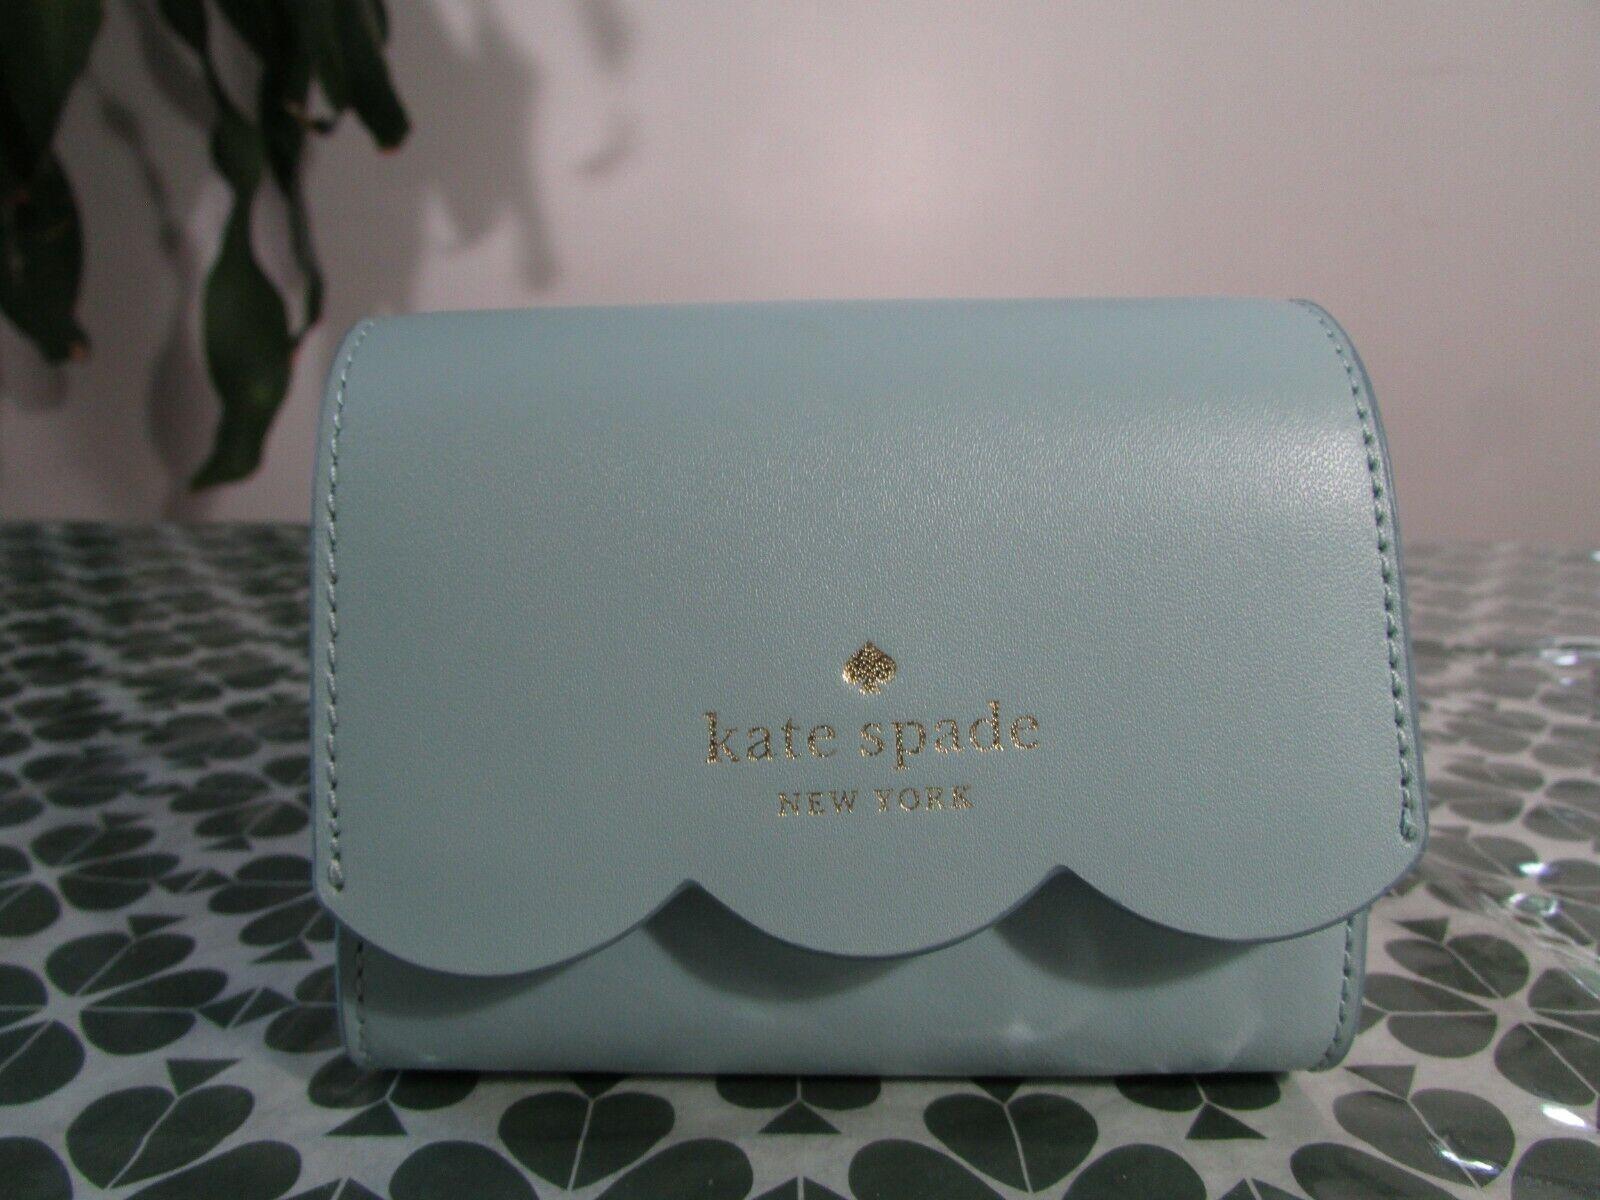 NWT Kate Spade Leather Gemma Small Flap Card Wallet Cloud Mist